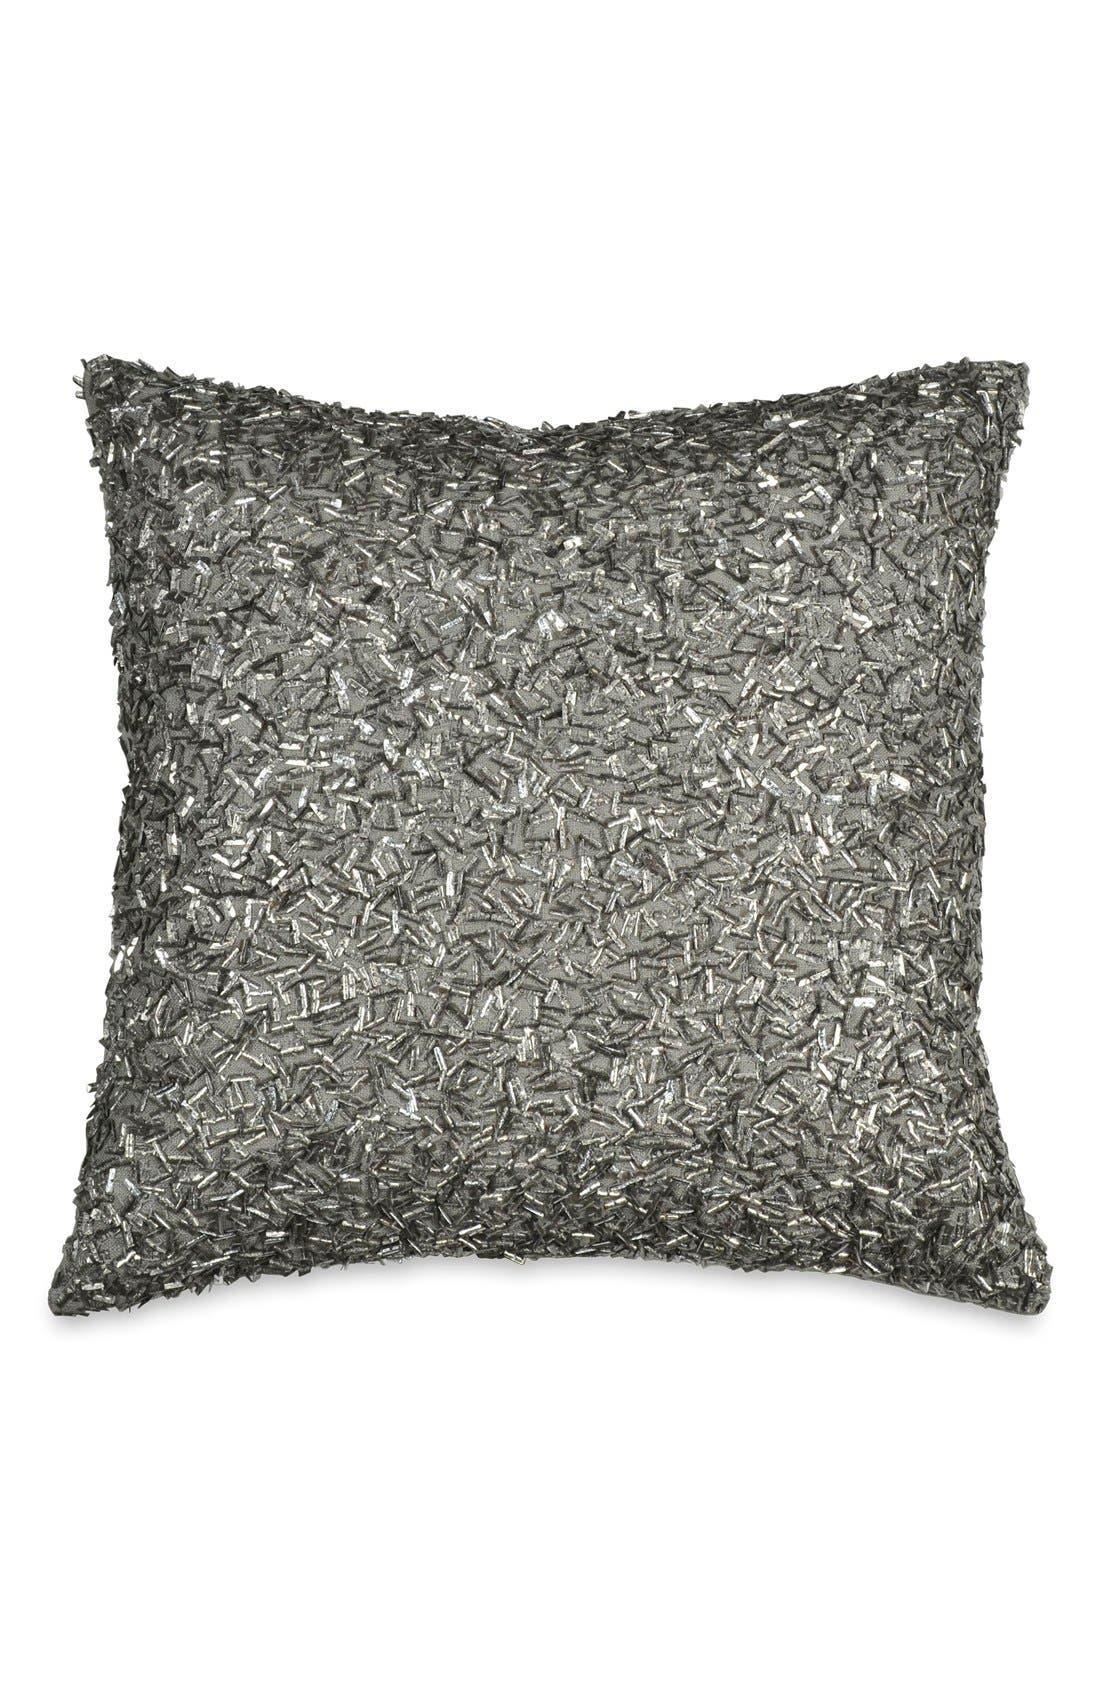 Donna Karan Collection 'Exhale' Pillow,                             Main thumbnail 1, color,                             060